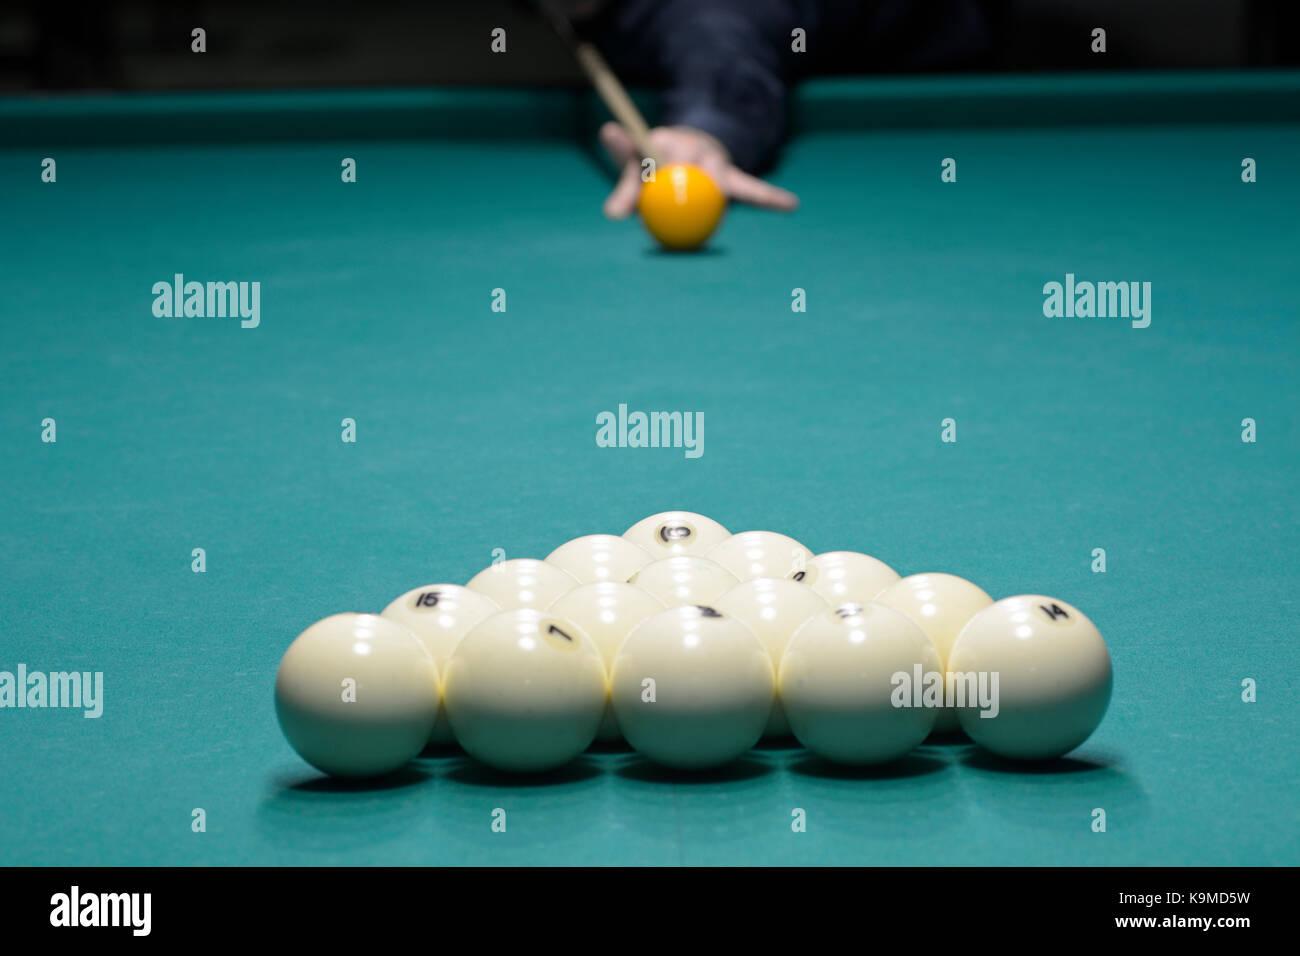 Russian Billiards Stock Photos Amp Russian Billiards Stock